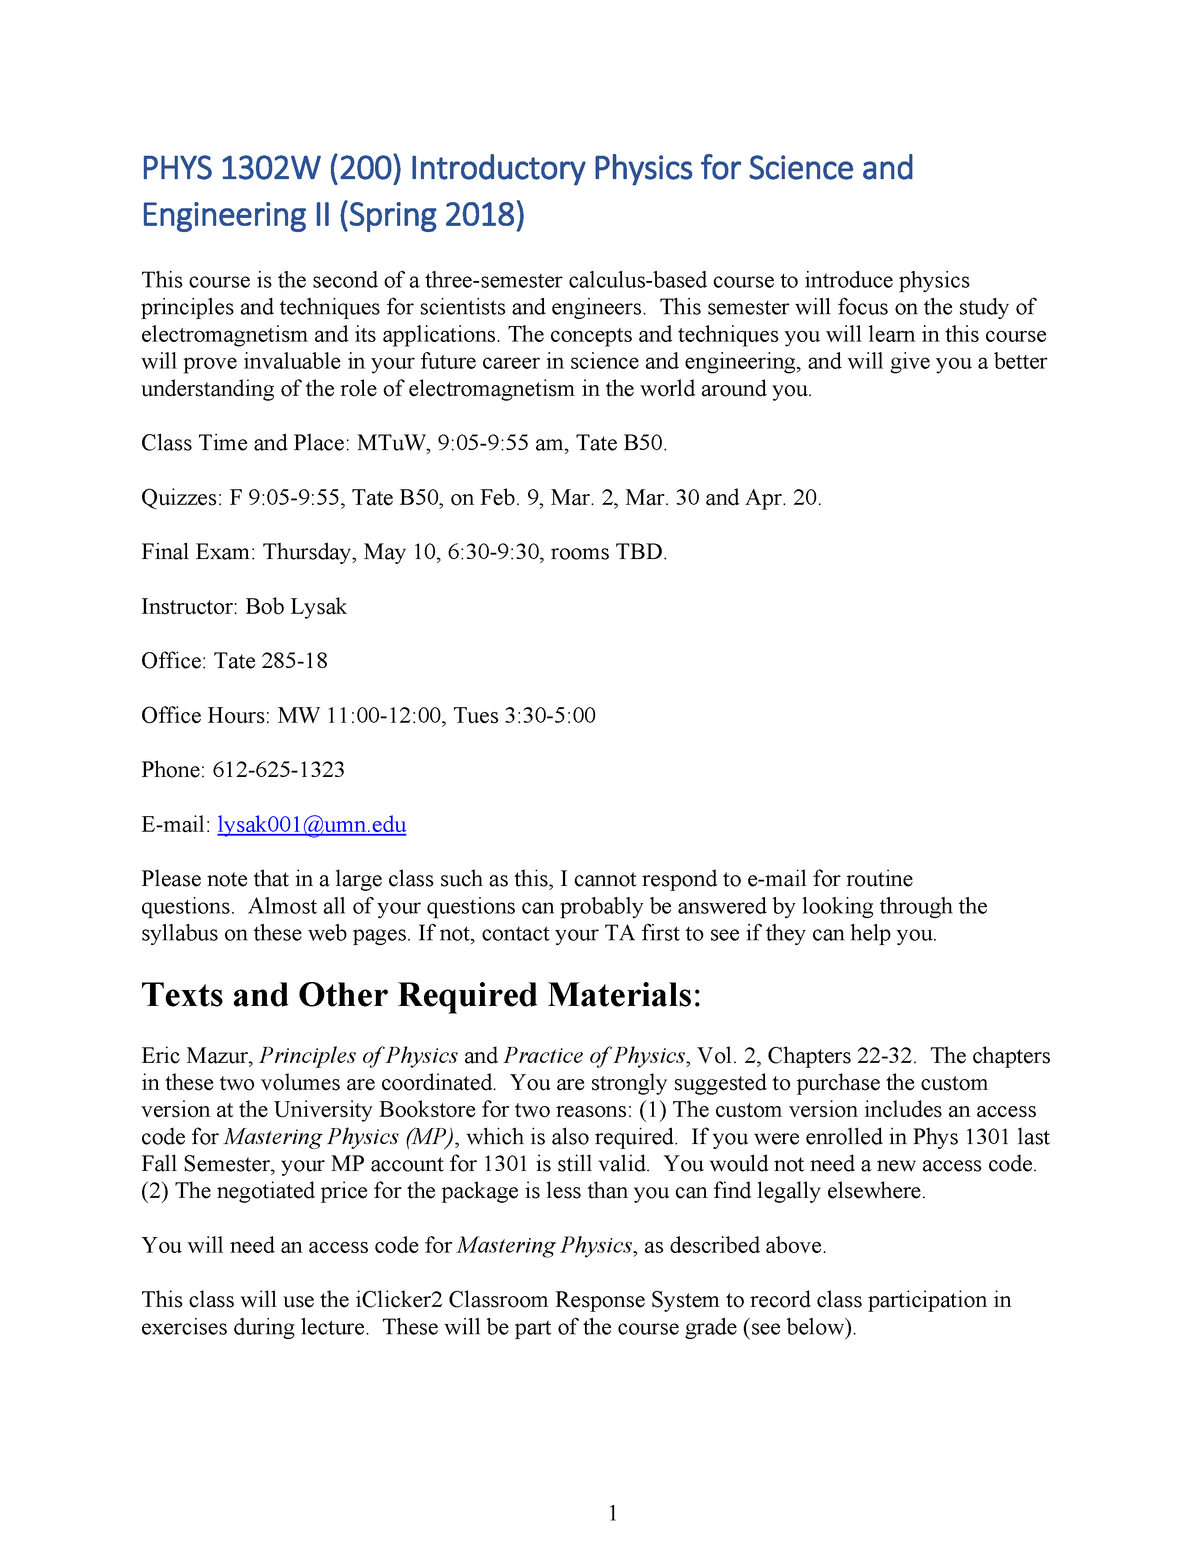 PHYS 1302W Syllabus Spring 2018 - the U of M - StuDocu